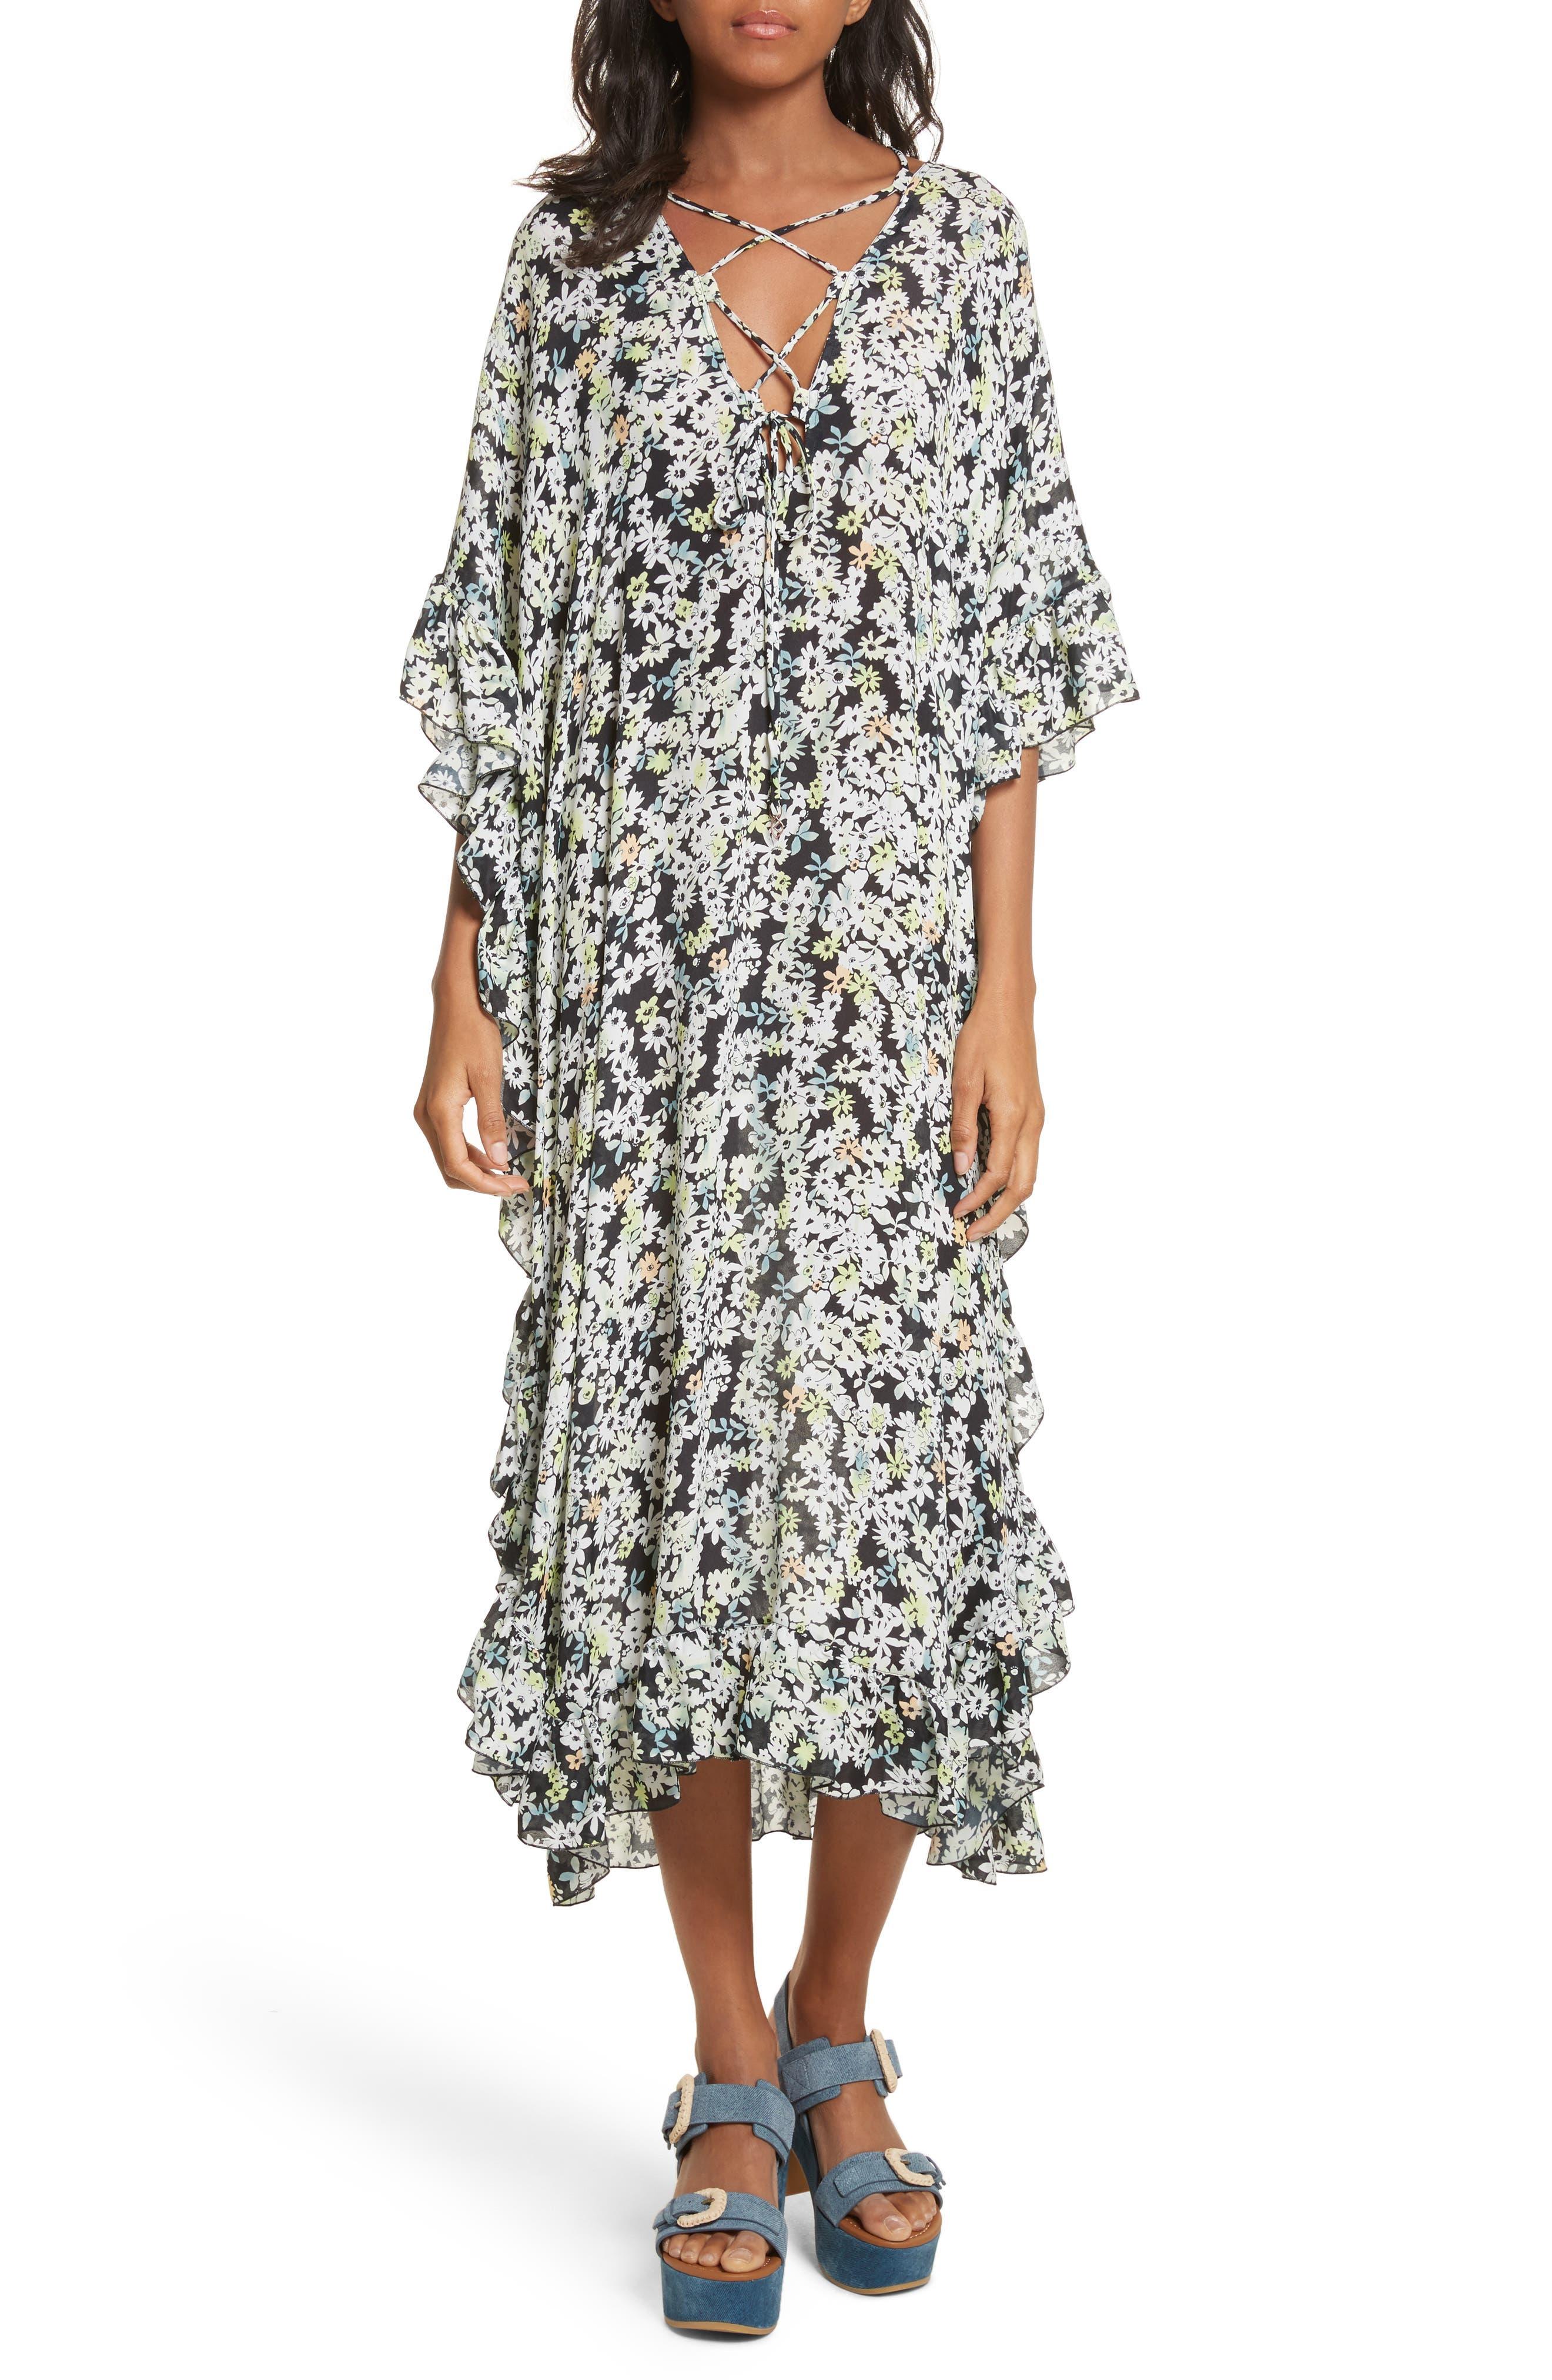 SEE BY CHLOÉ Floral Print Flutter Edge Dress, Main, color, 021